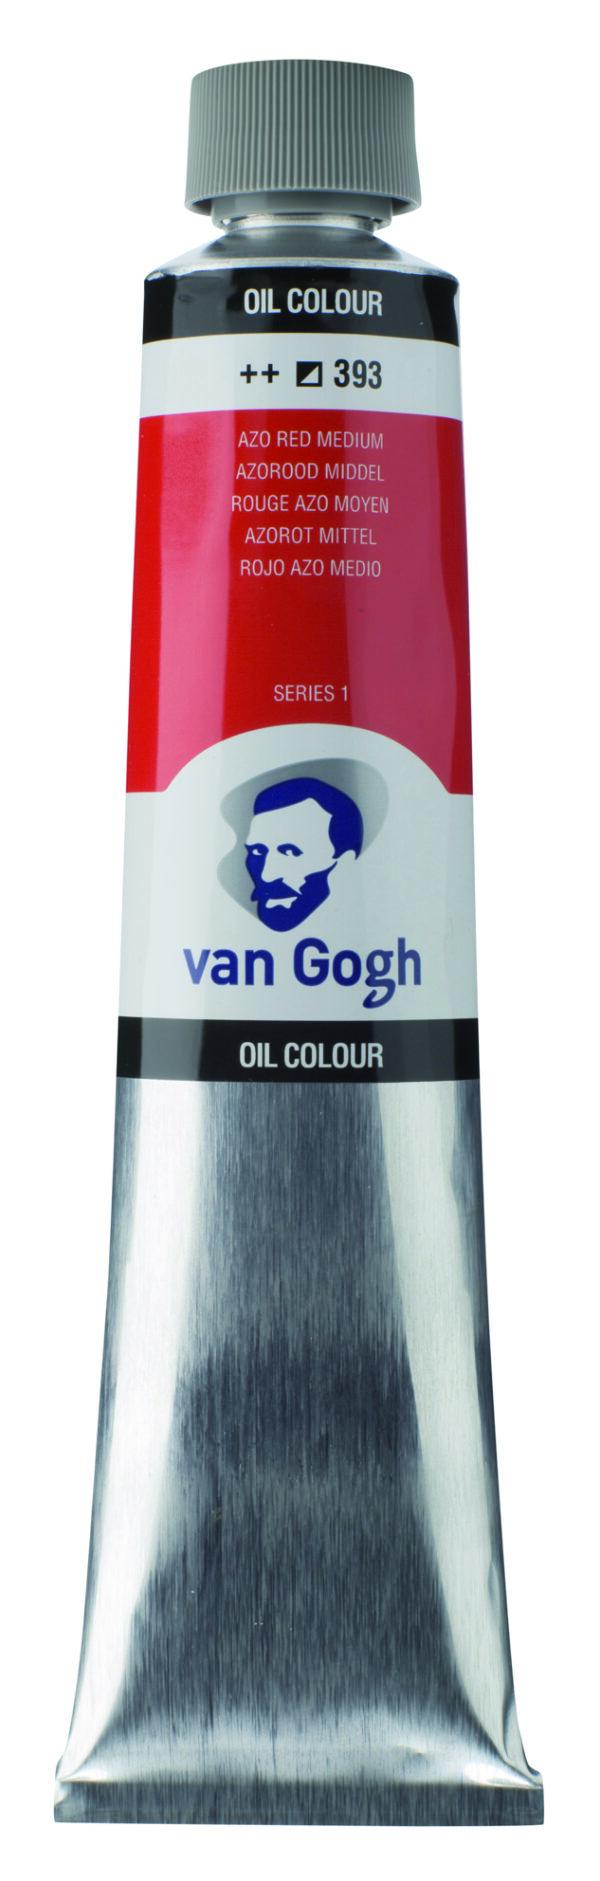 Van Gogh 393 Azo red Medium - 200 ml